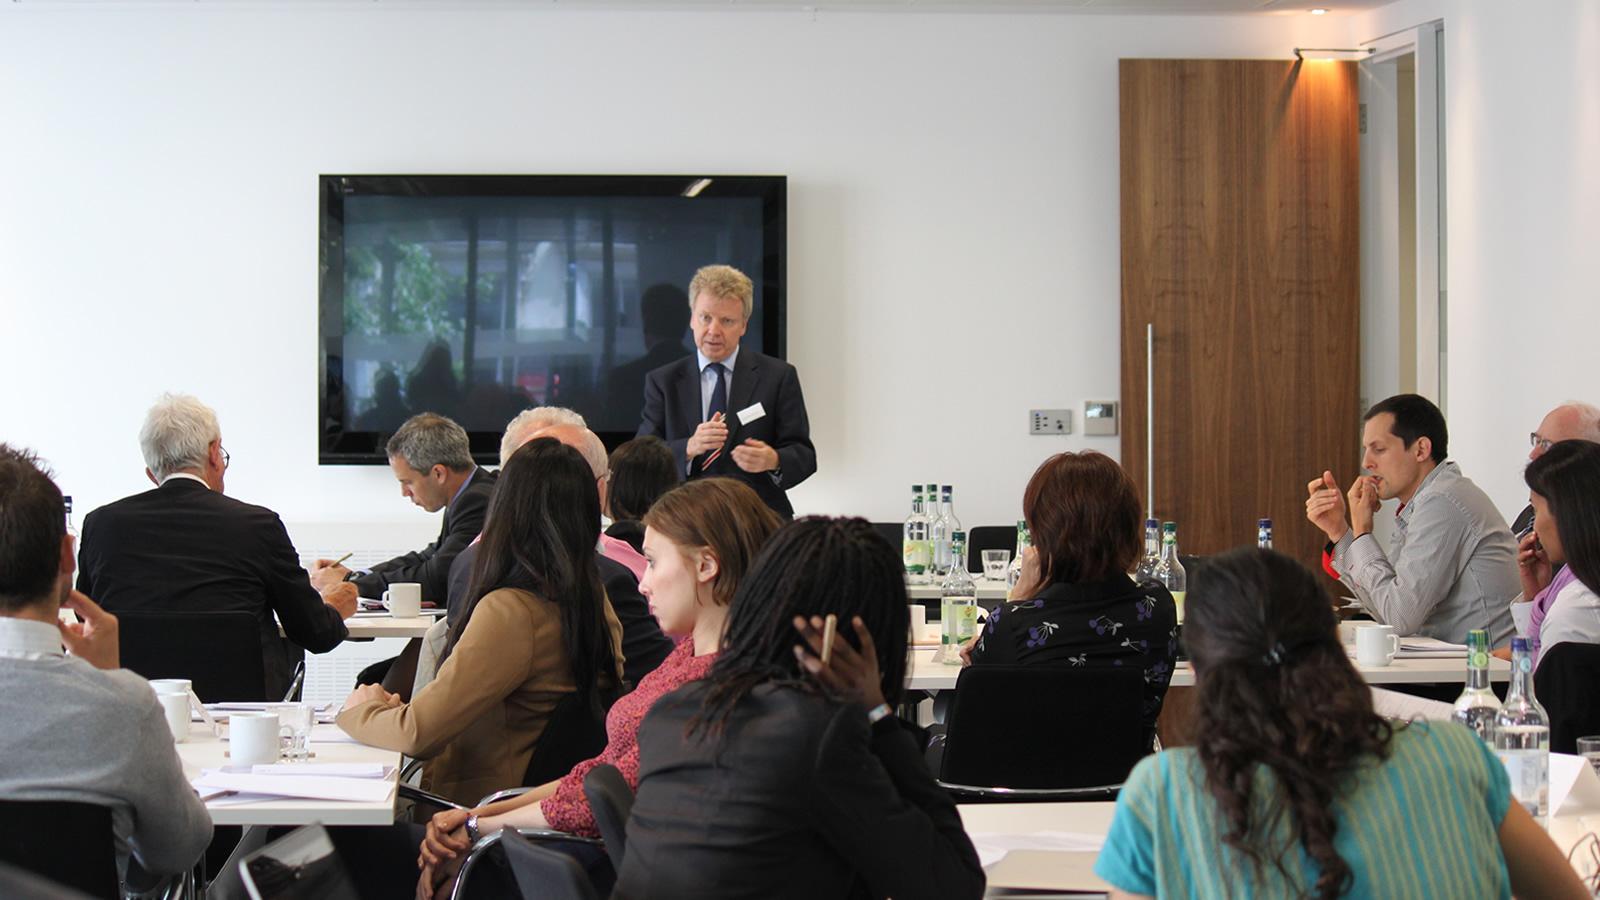 2012 Olympic Values Symposium Participants